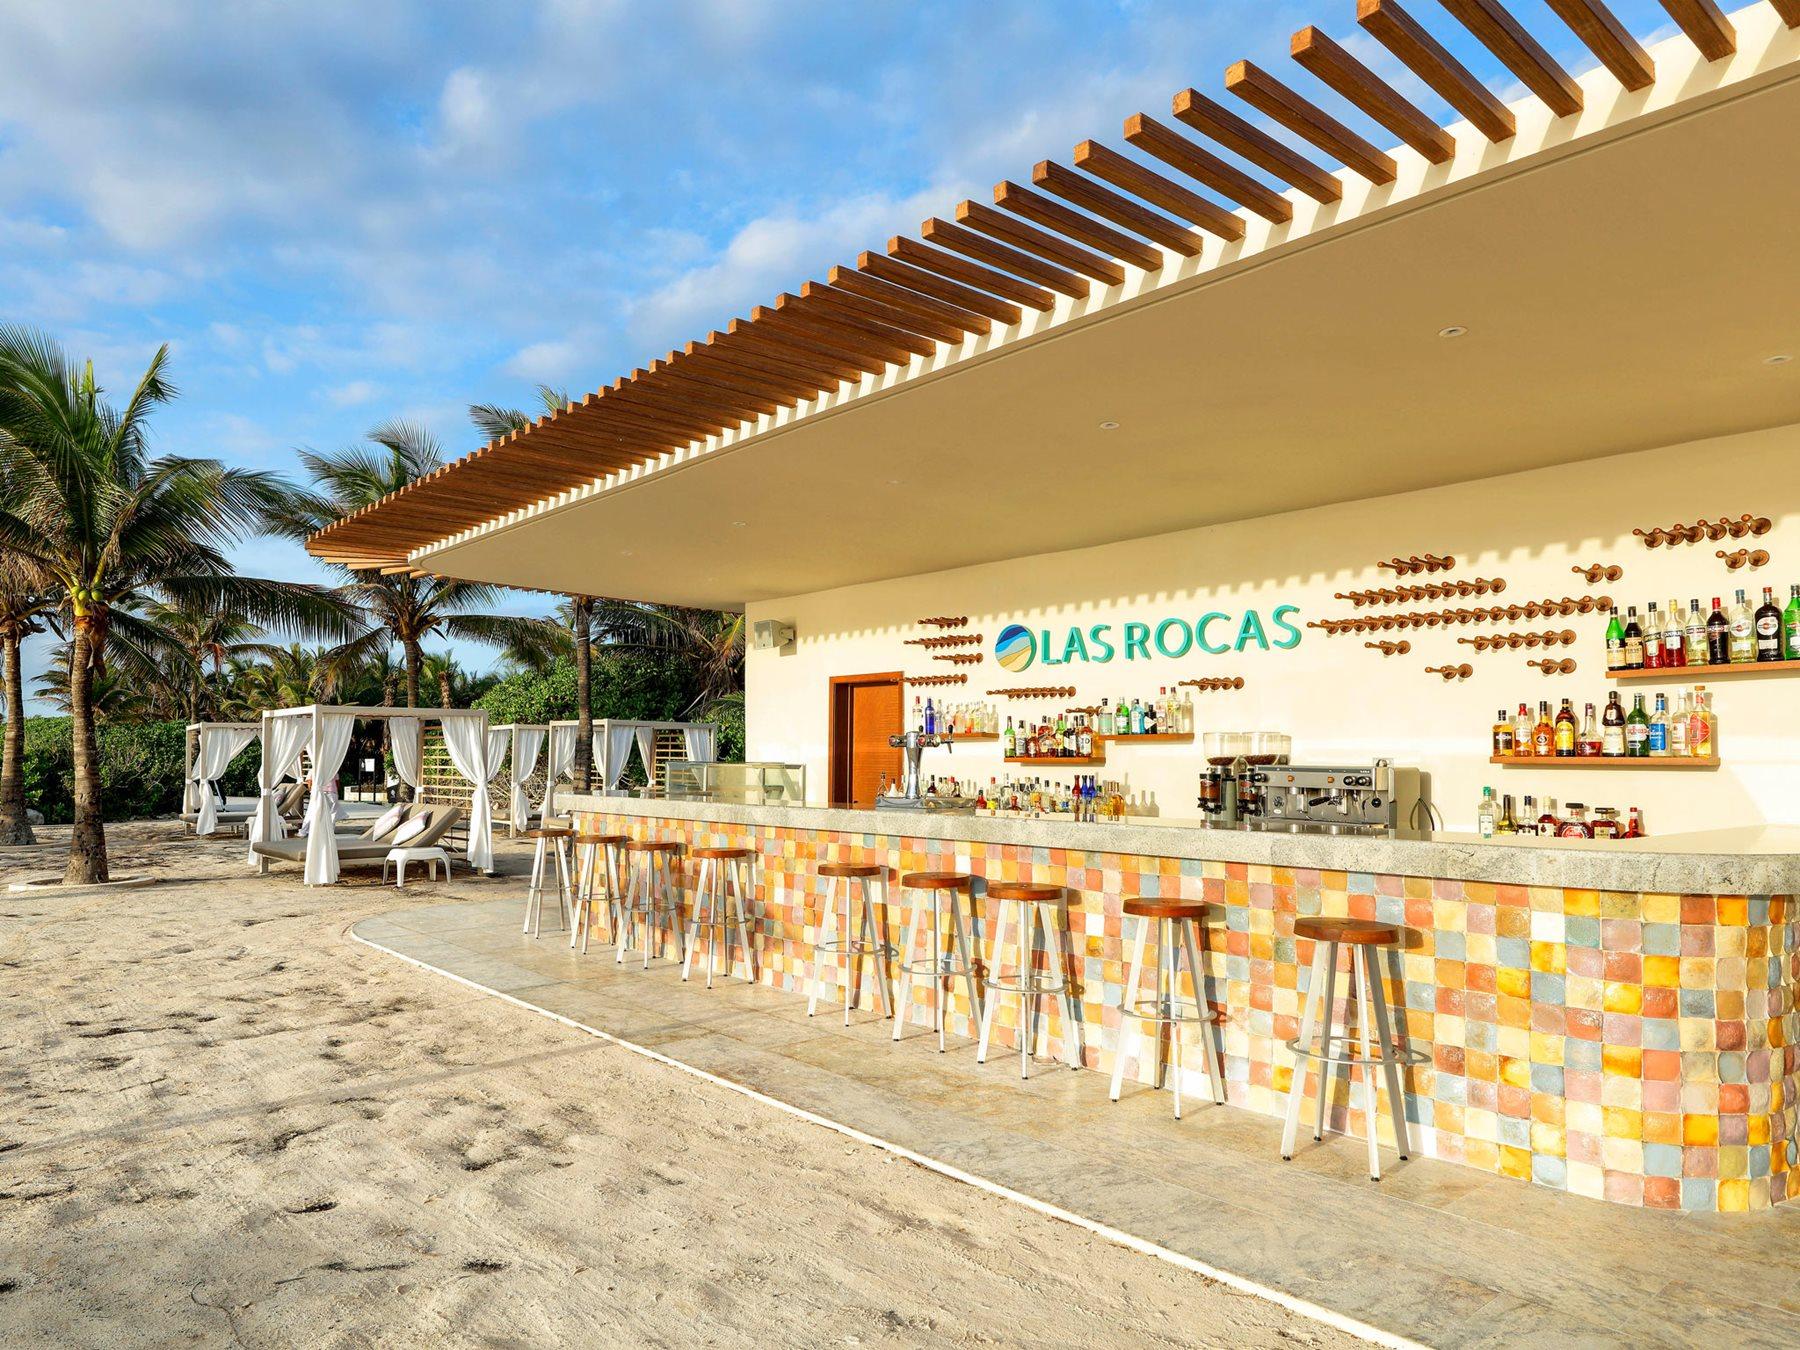 RIV-TRS-Yucatan-Bar-Las-Rocas-001